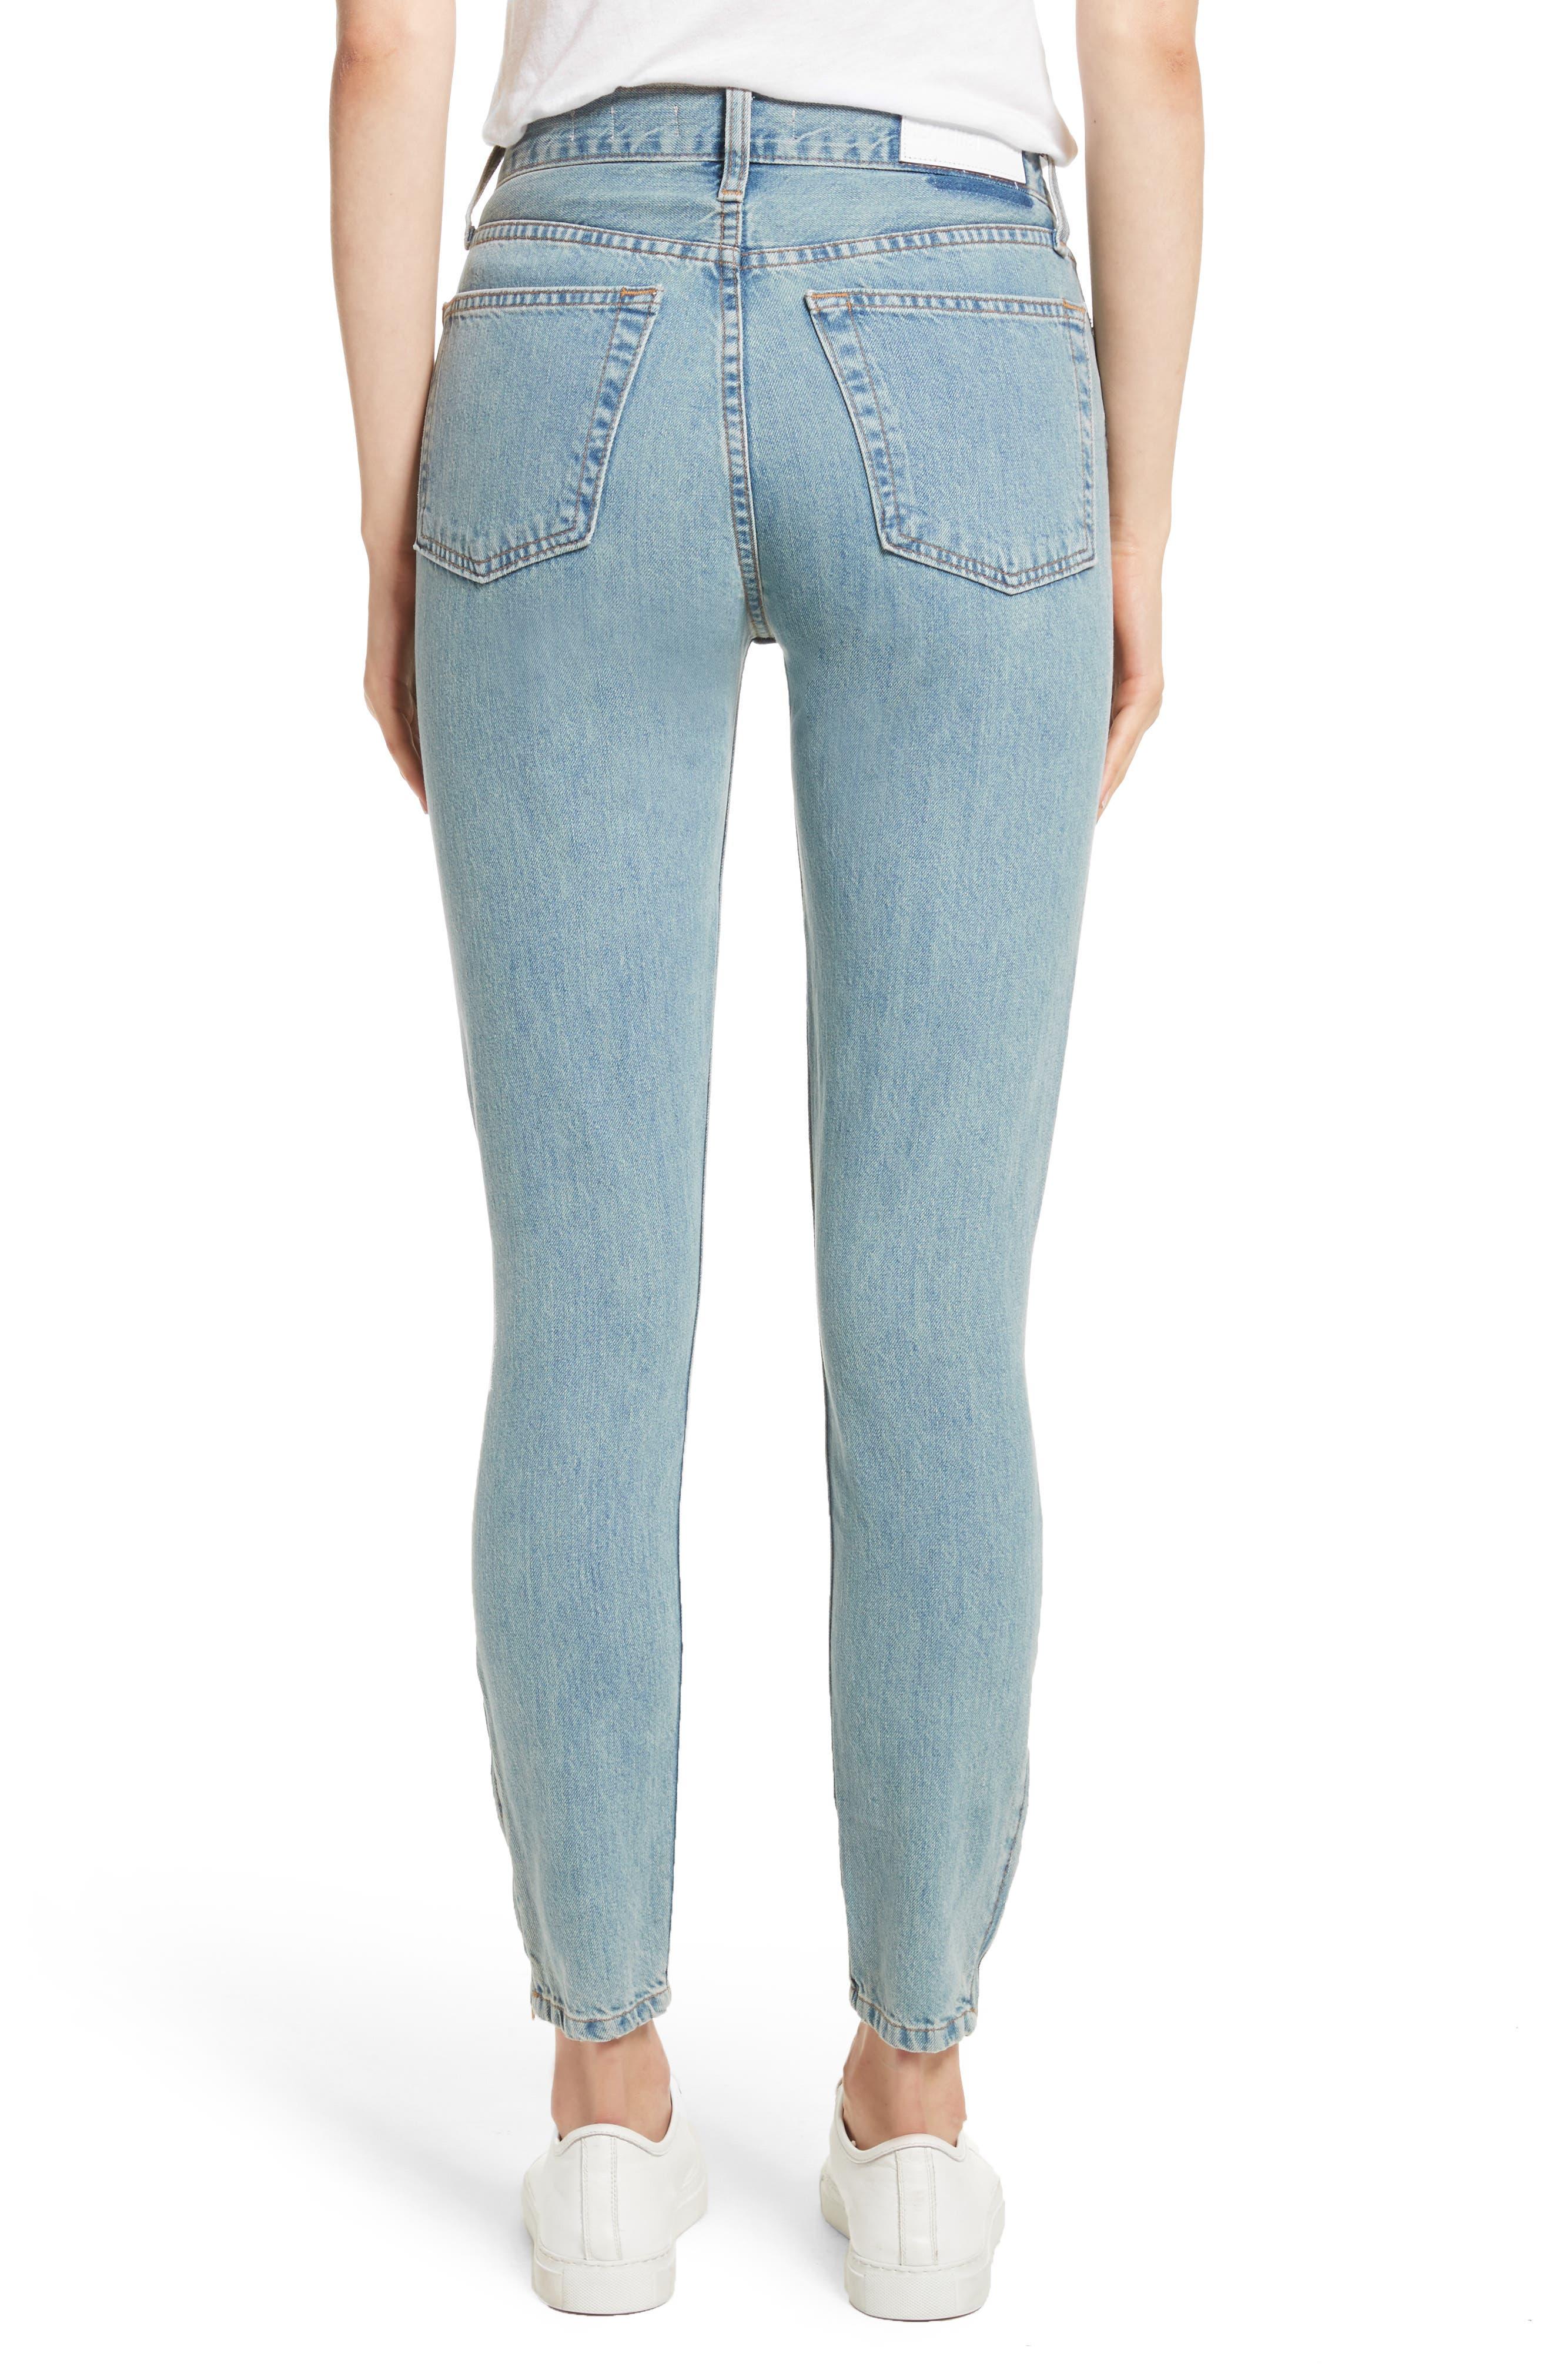 Alternate Image 2  - Re/Done Originals High Waist Ankle Zip Jeans